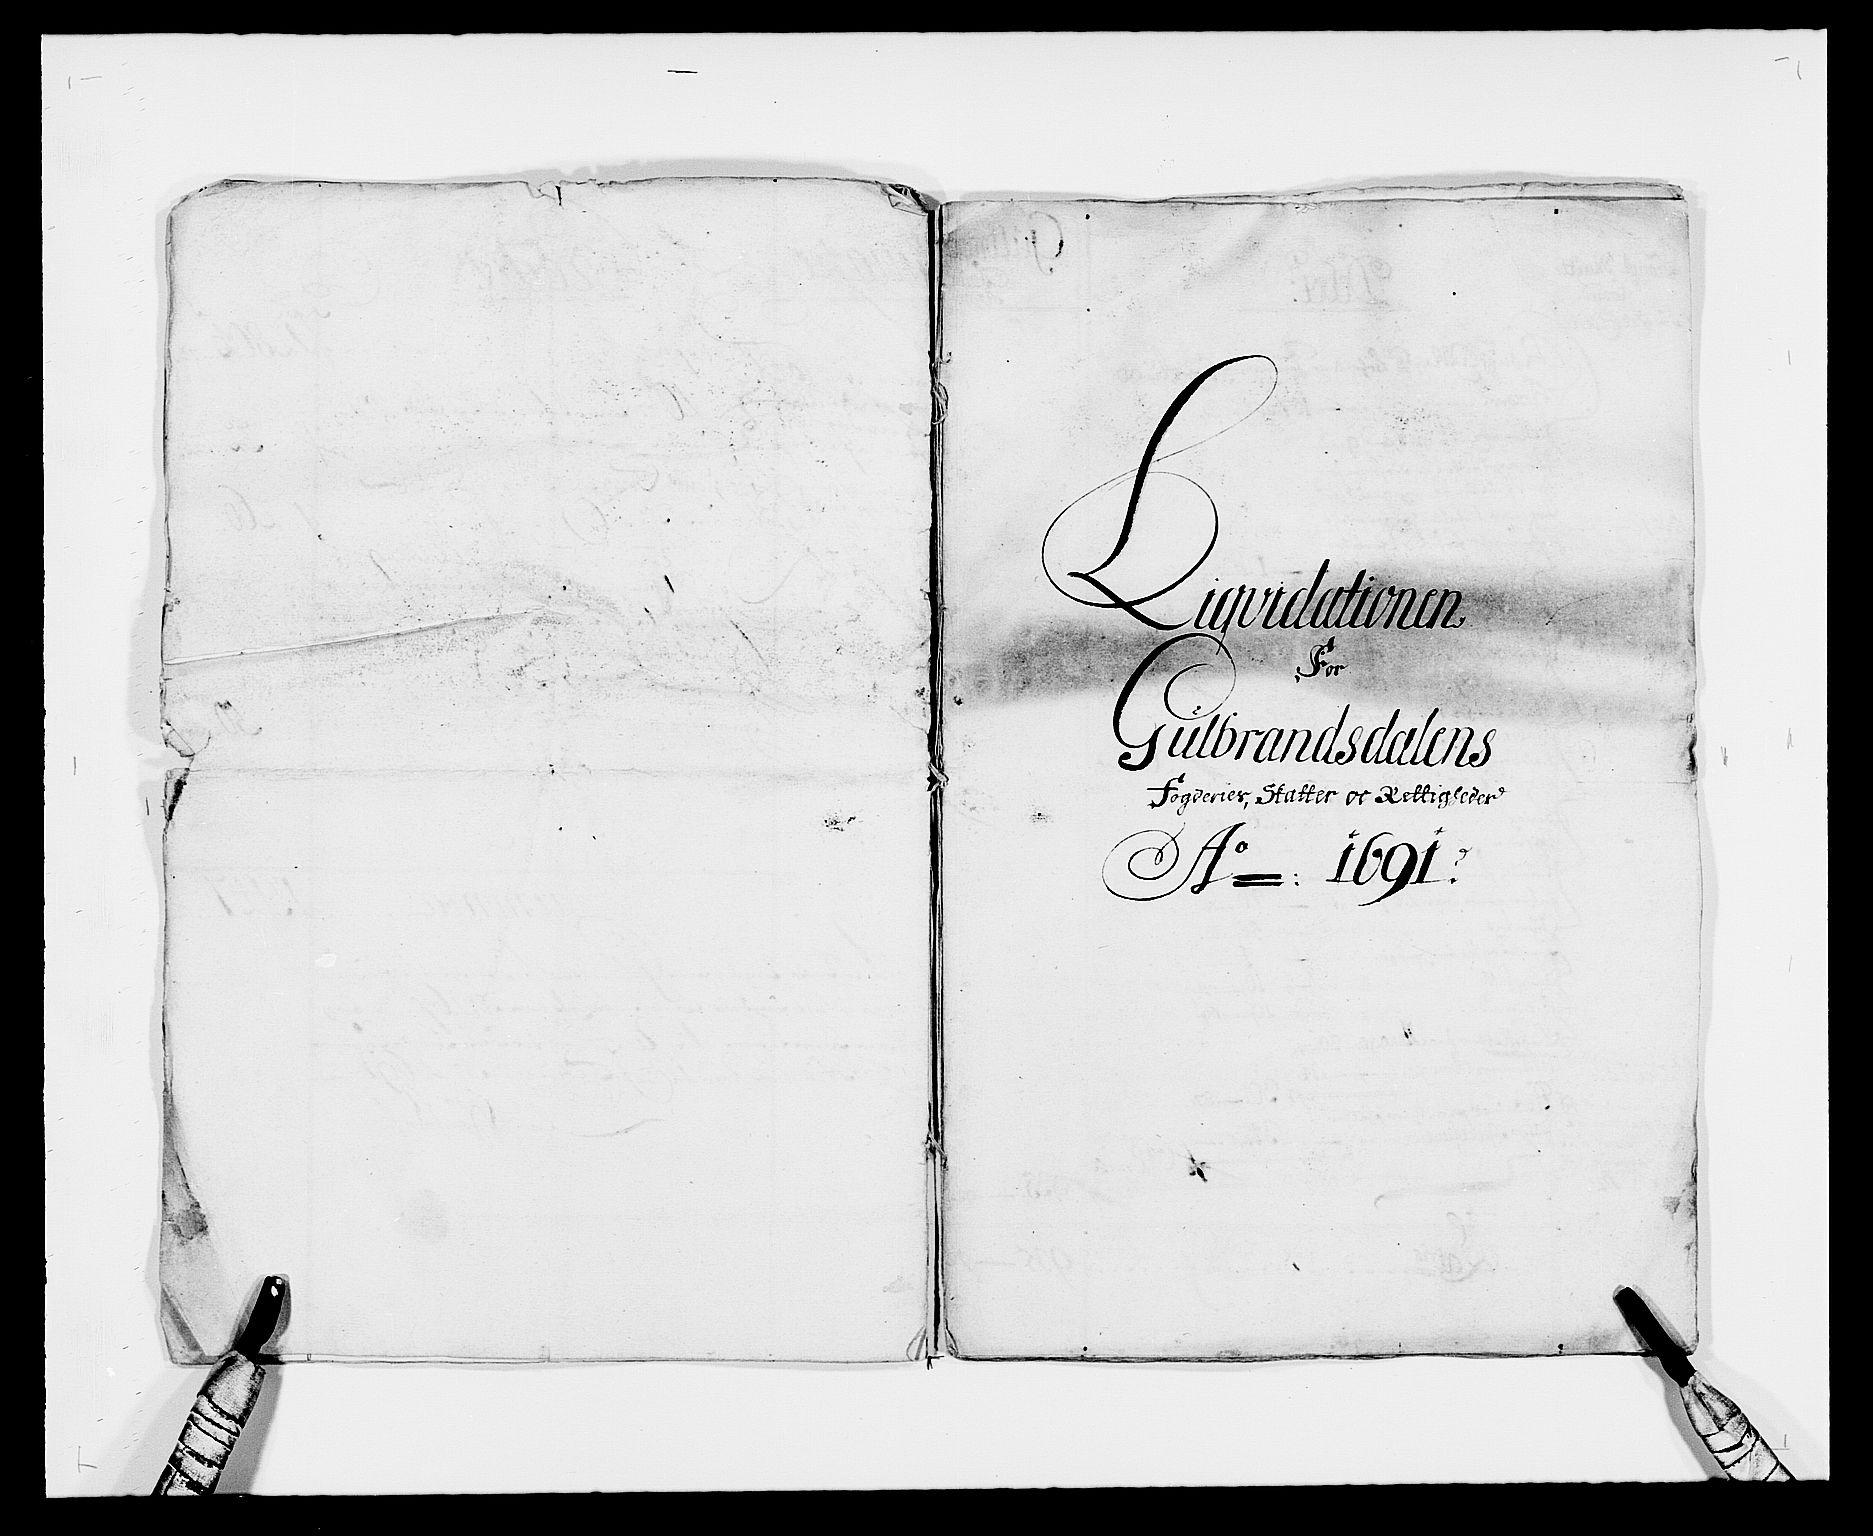 RA, Rentekammeret inntil 1814, Reviderte regnskaper, Fogderegnskap, R17/L1165: Fogderegnskap Gudbrandsdal, 1690-1692, s. 7